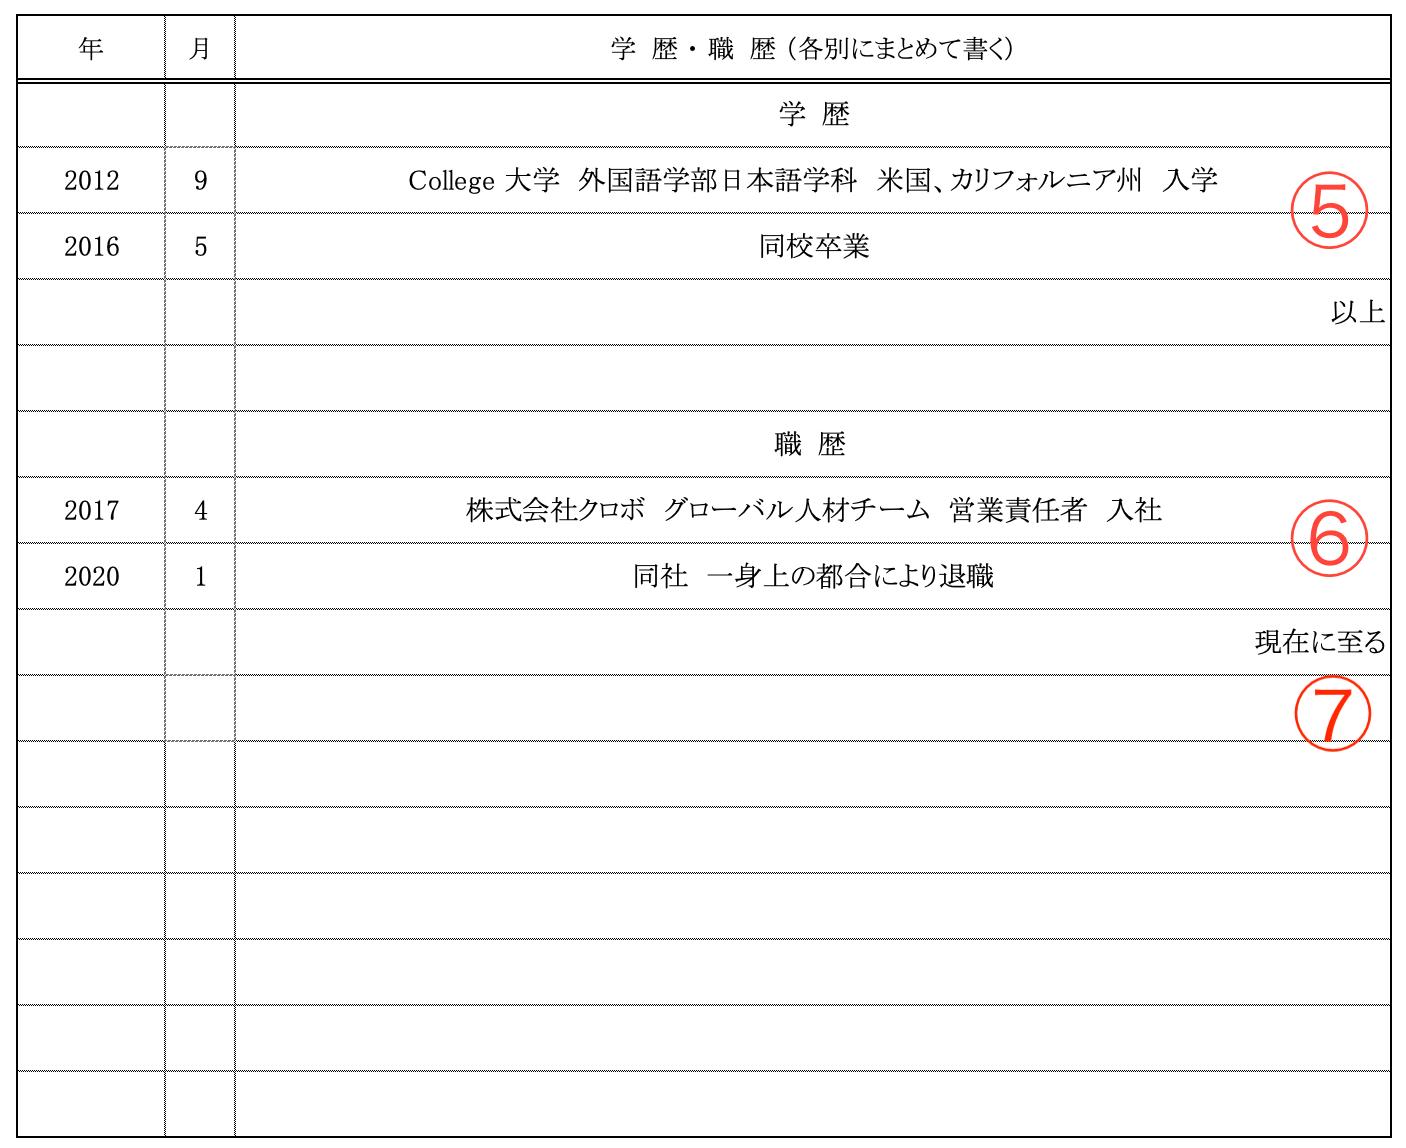 Sample Japanese Resume Format from crobo.co.jp